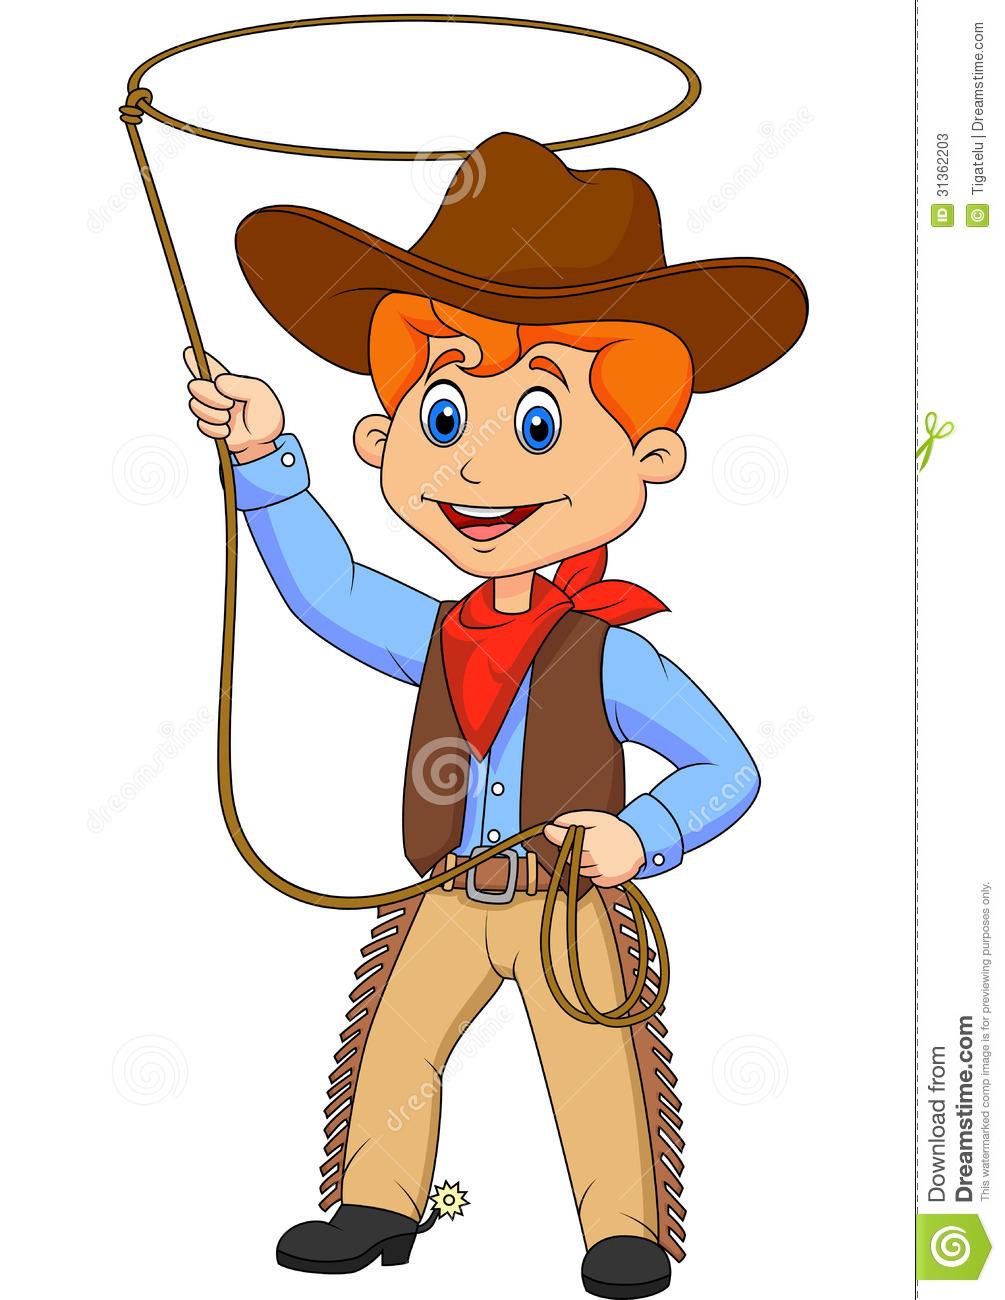 vector transparent Cartoon pictures of cowboys. Lasso clipart wild west.